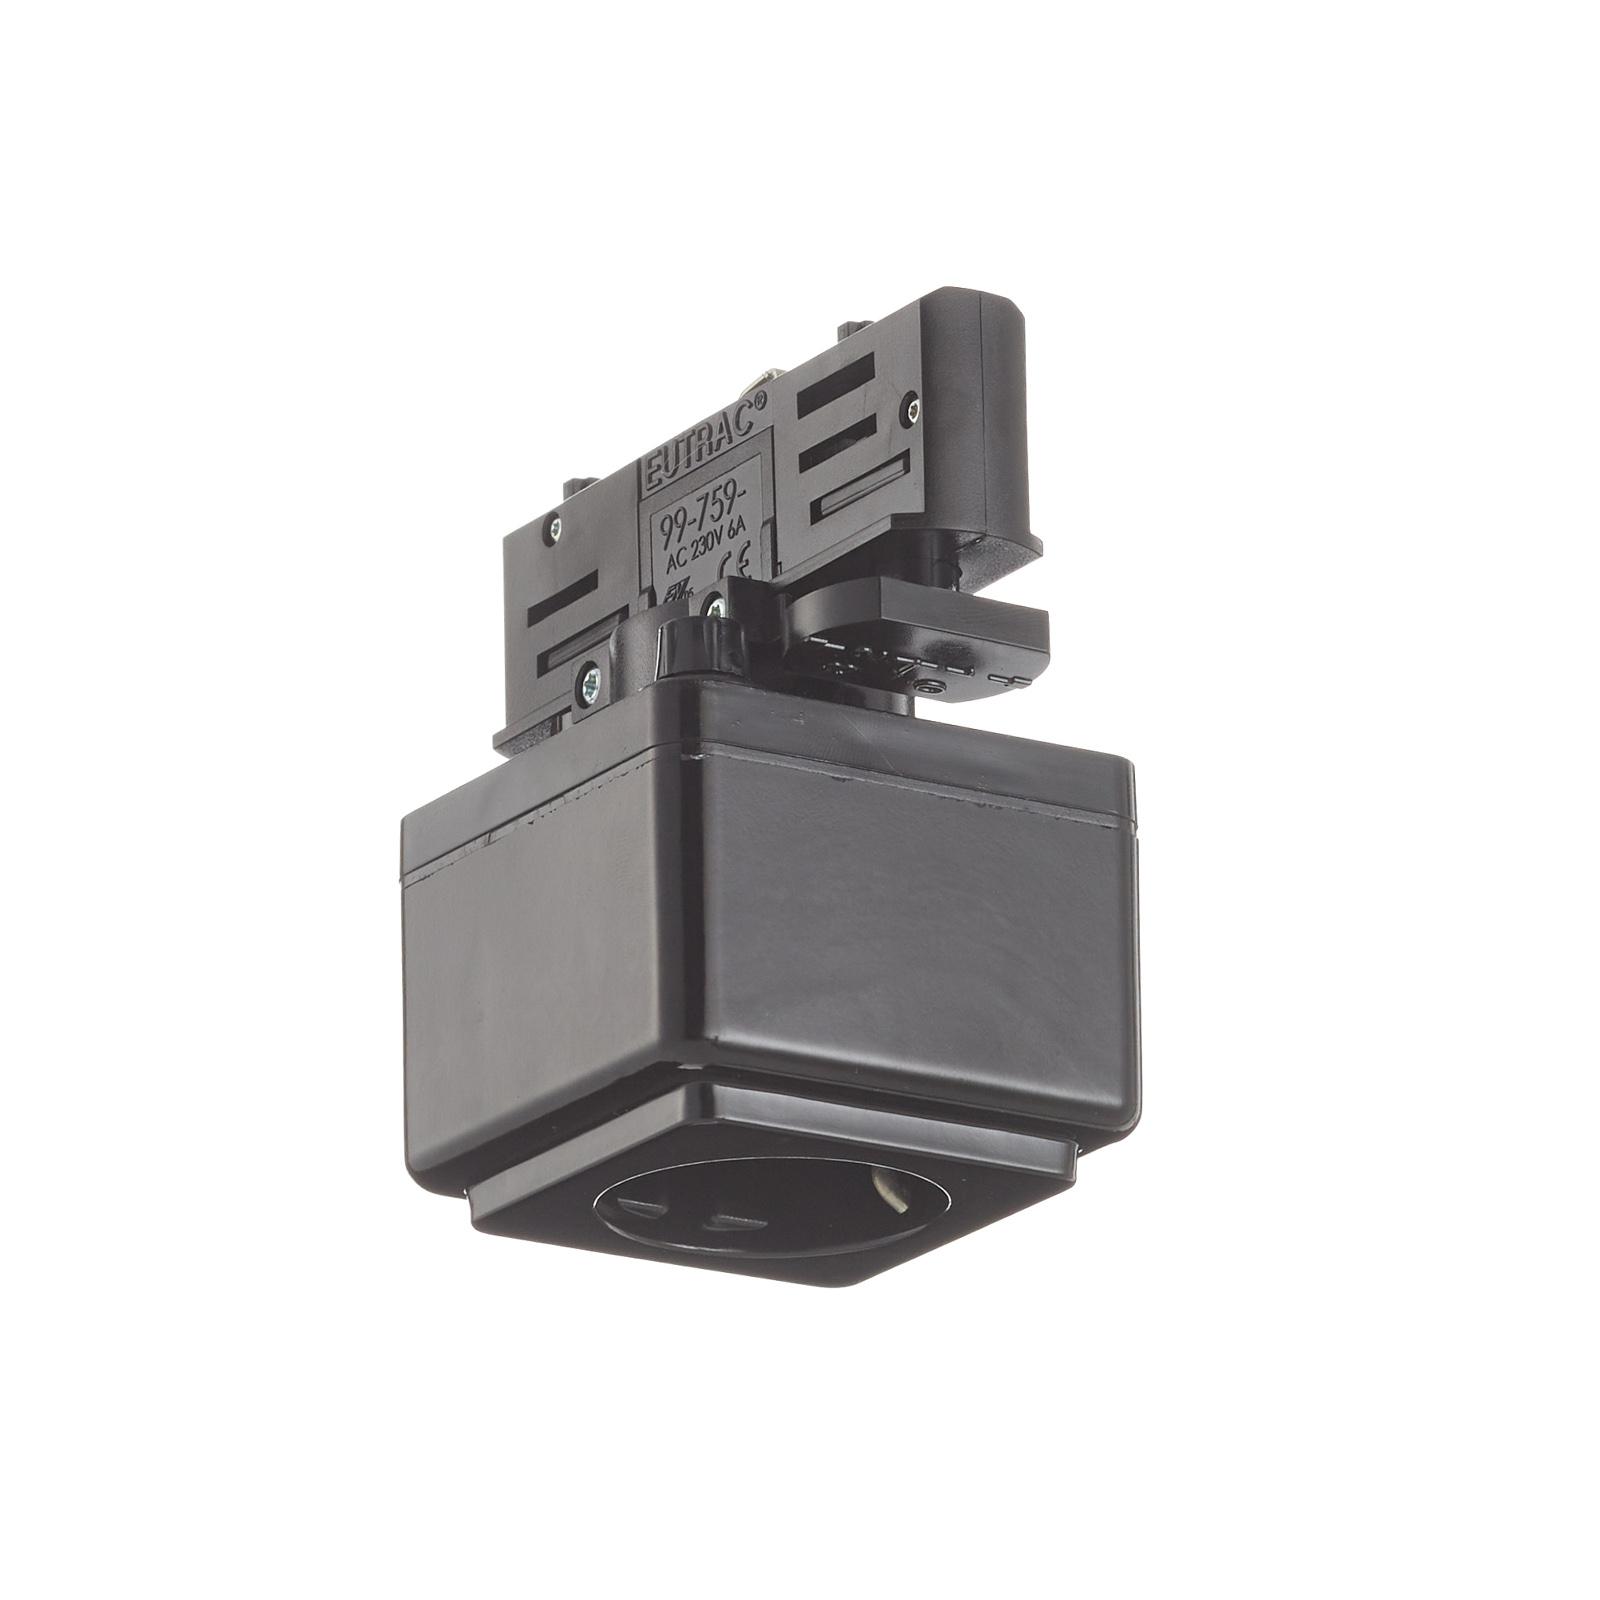 Eutrac Steckdosen Multi-Adapter 3-Phasen, schwarz